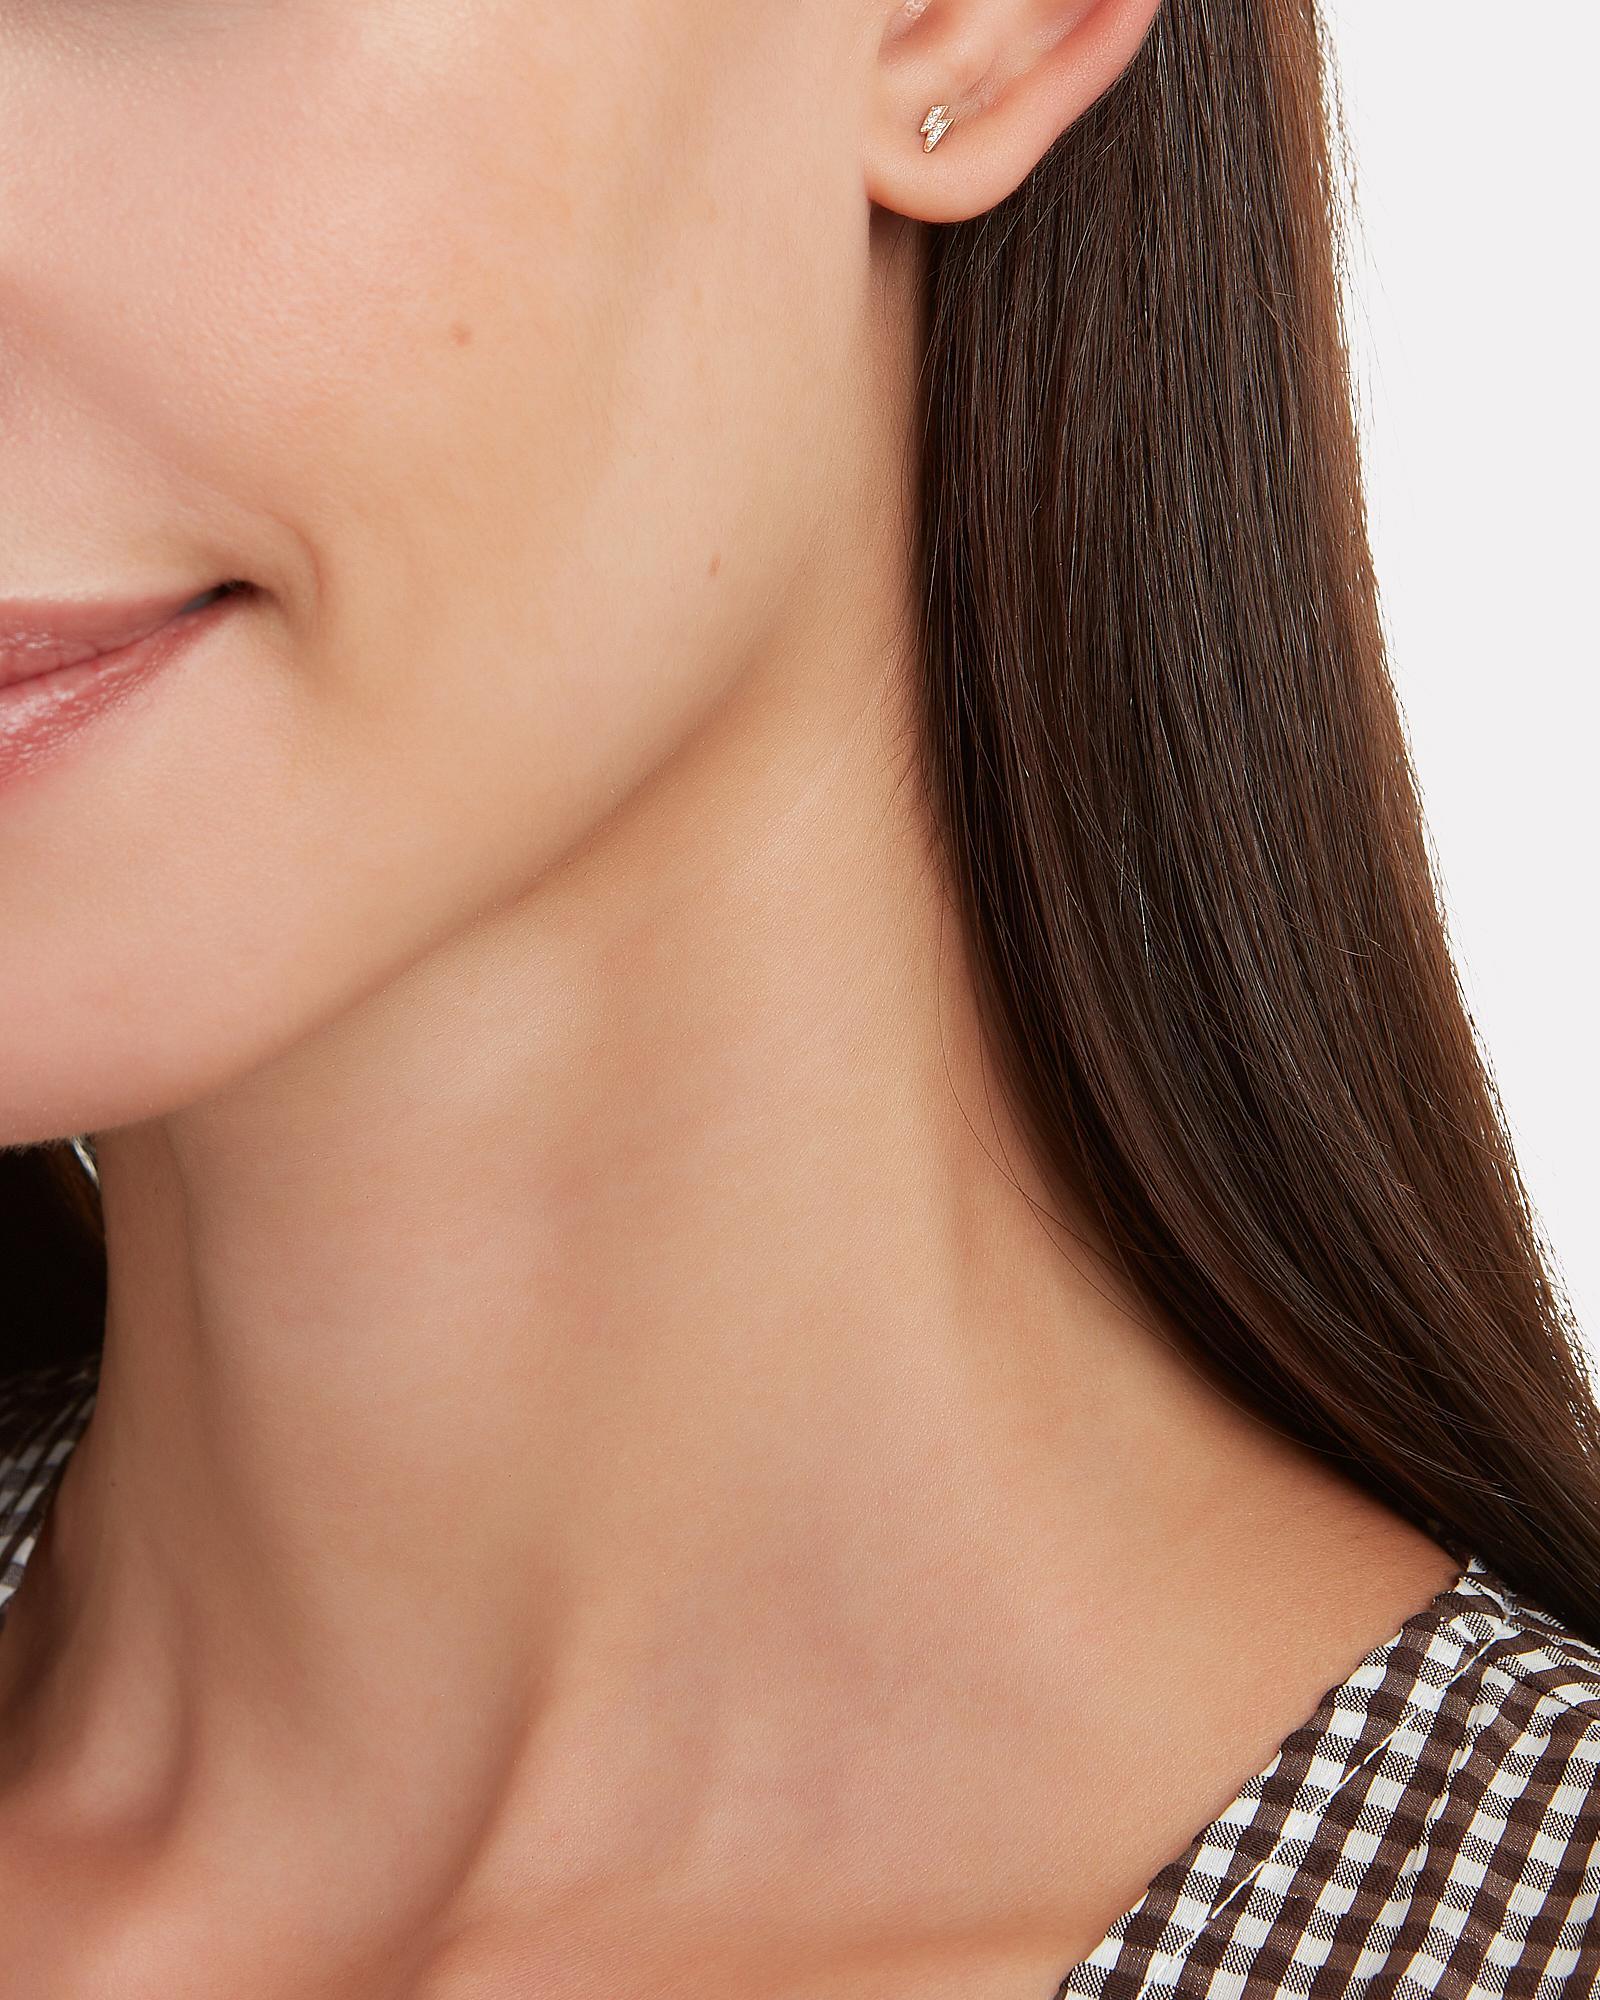 106dbe6c4 Zoe Chicco - Metallic Lightning Bolt Single Stud Earring - Lyst. View  fullscreen